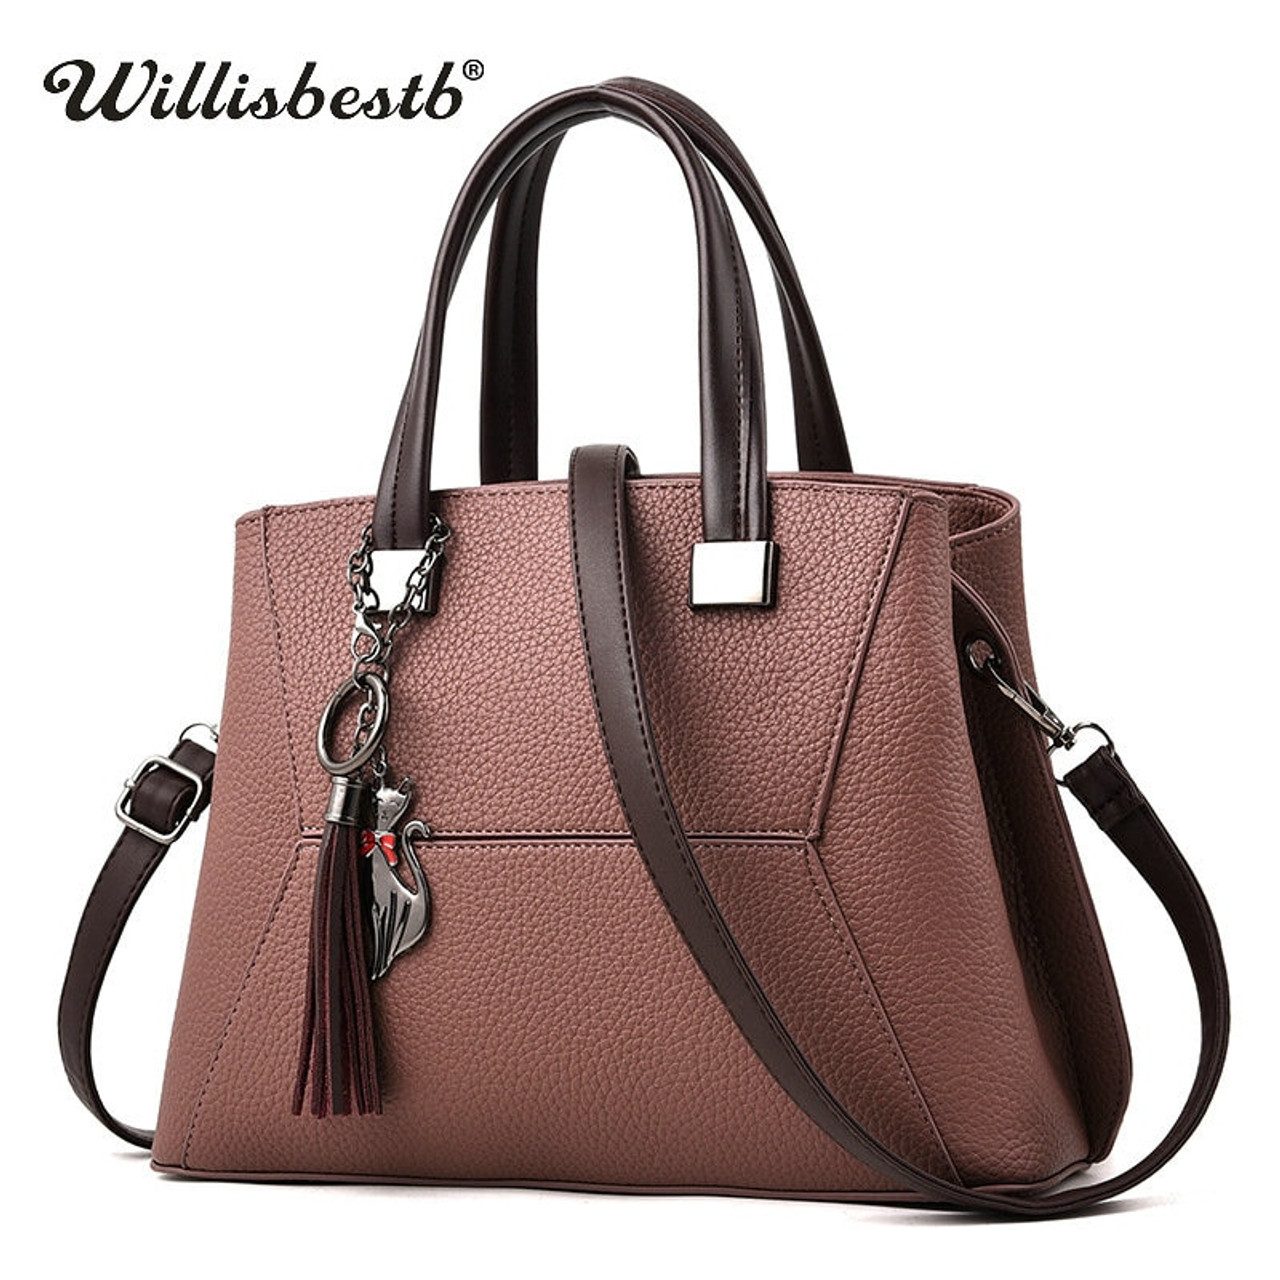 Fashion Tassel 2018 Women Handbag Luxury Brand Clutch Female Crossbody Bags  Soft Leather Designer Large Lady ... 07e4cfec0d3e9